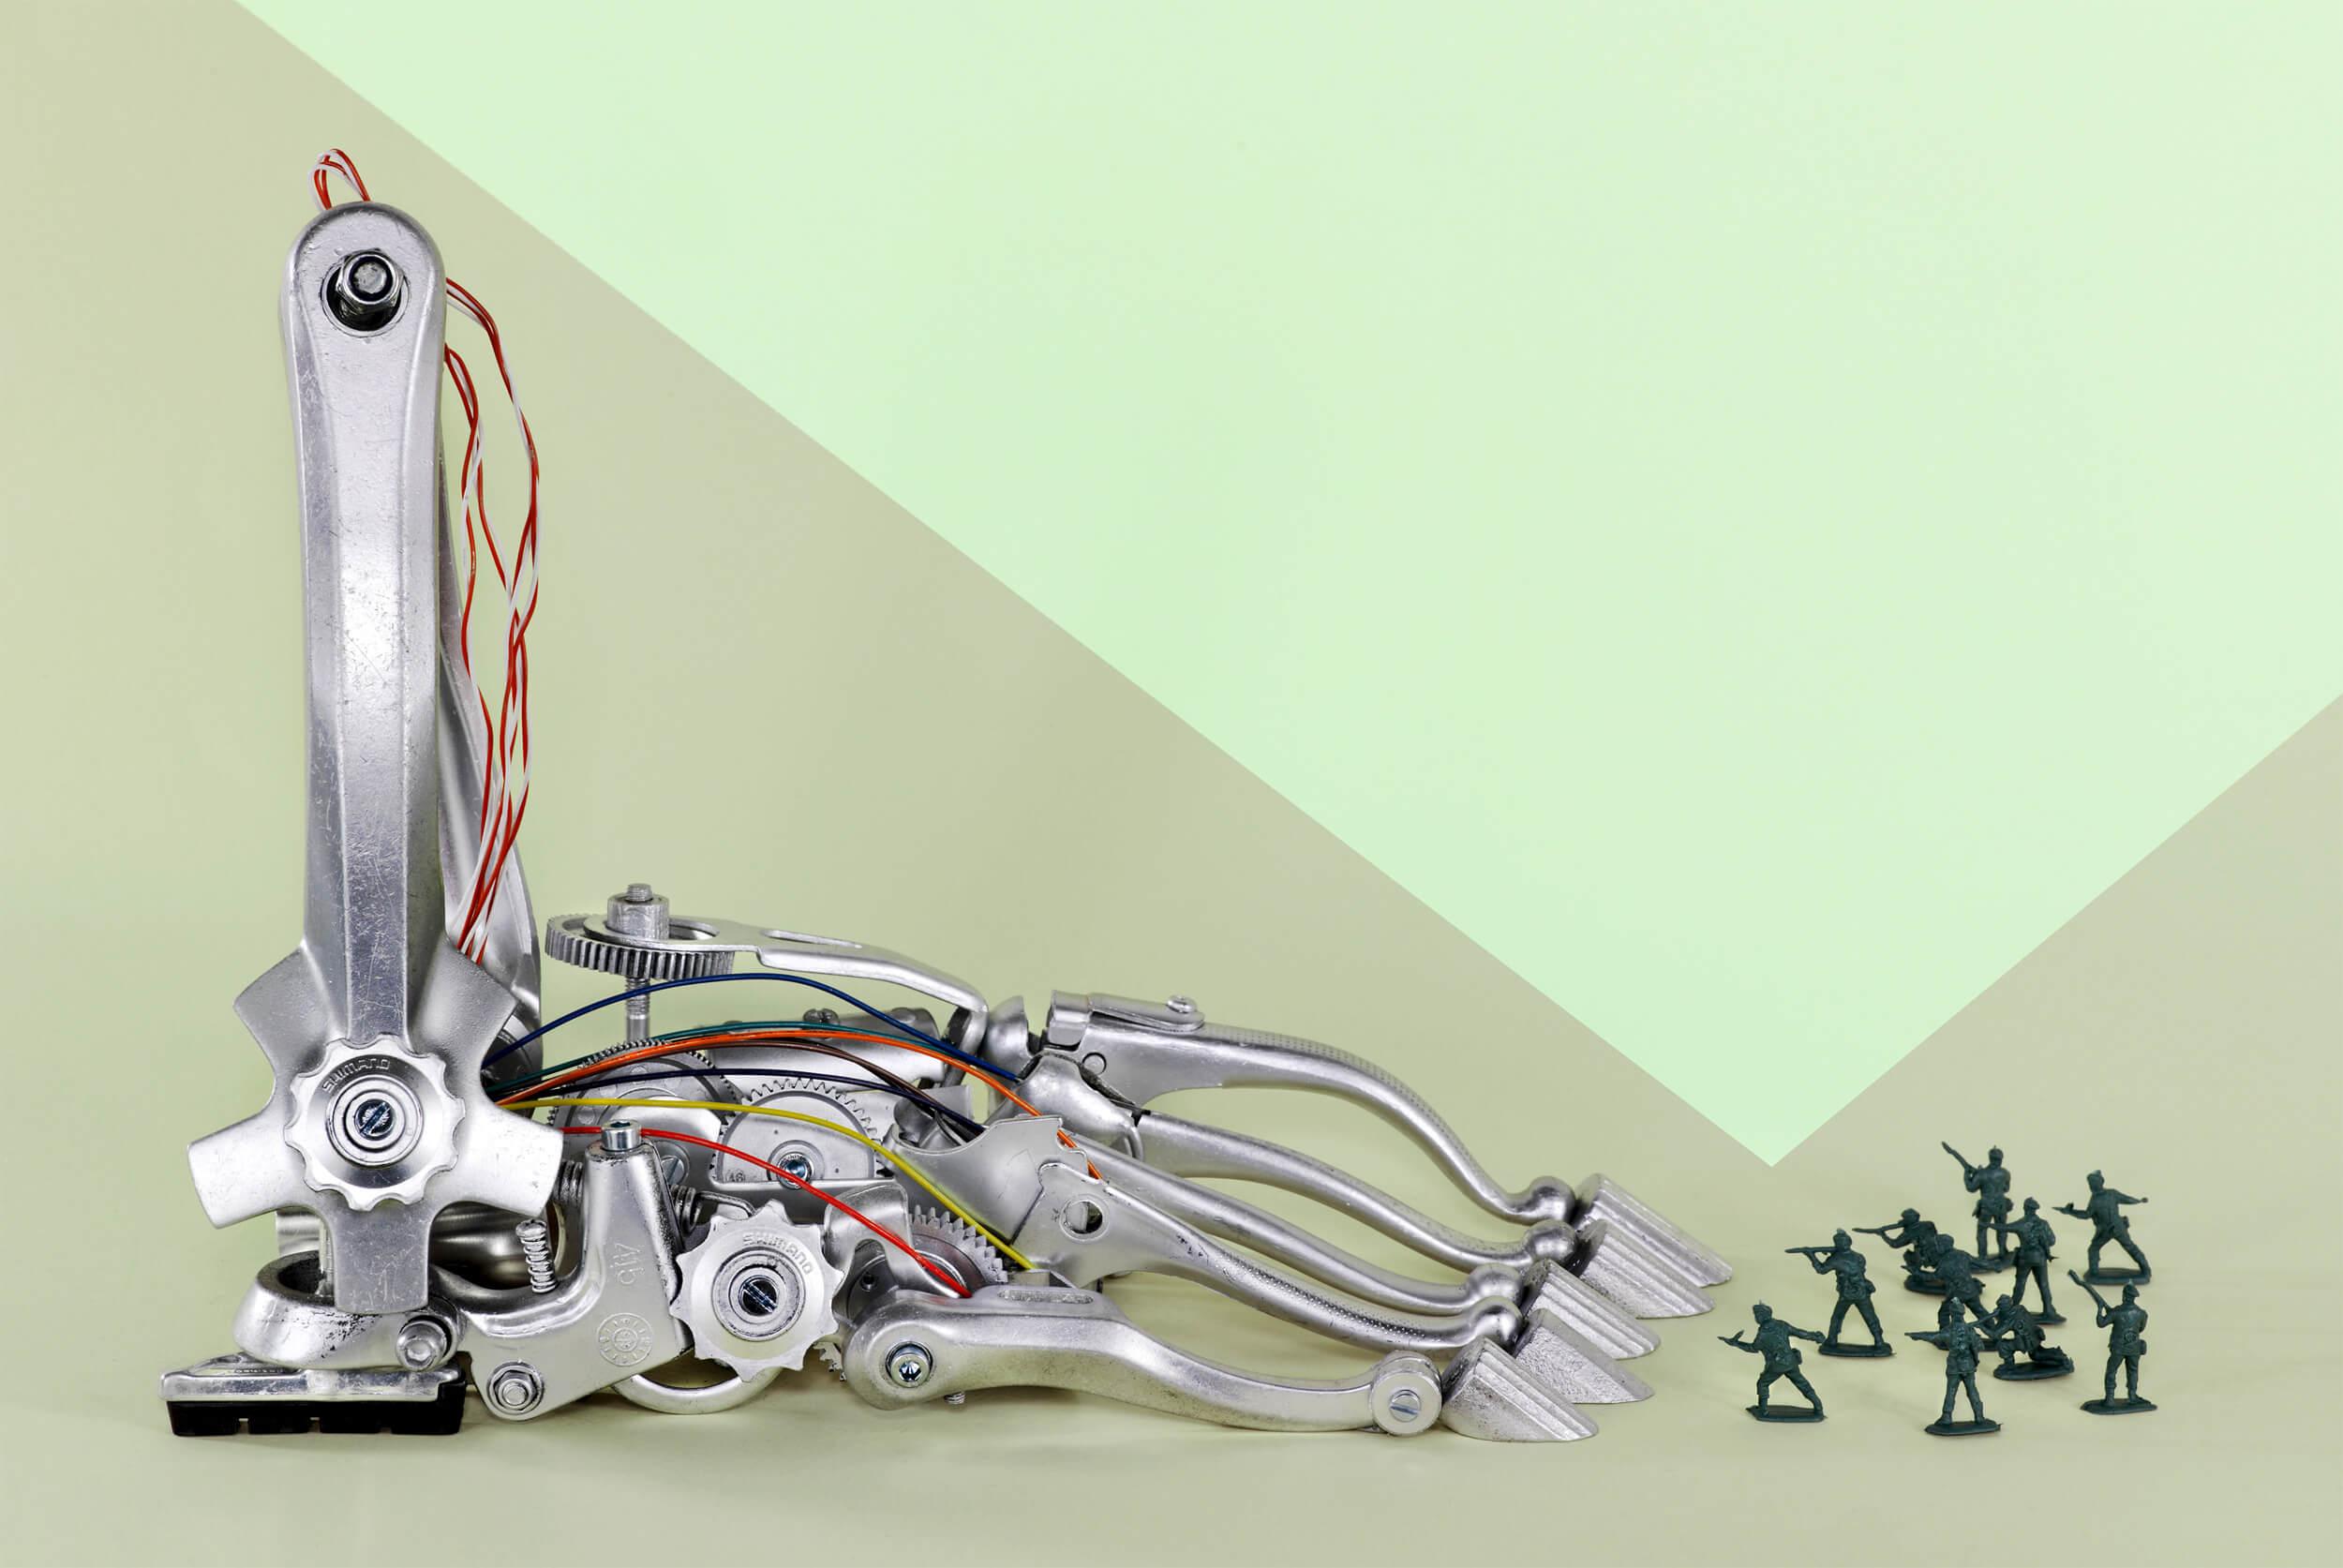 wired_tactileillustration_robot_katrinrodegast_web